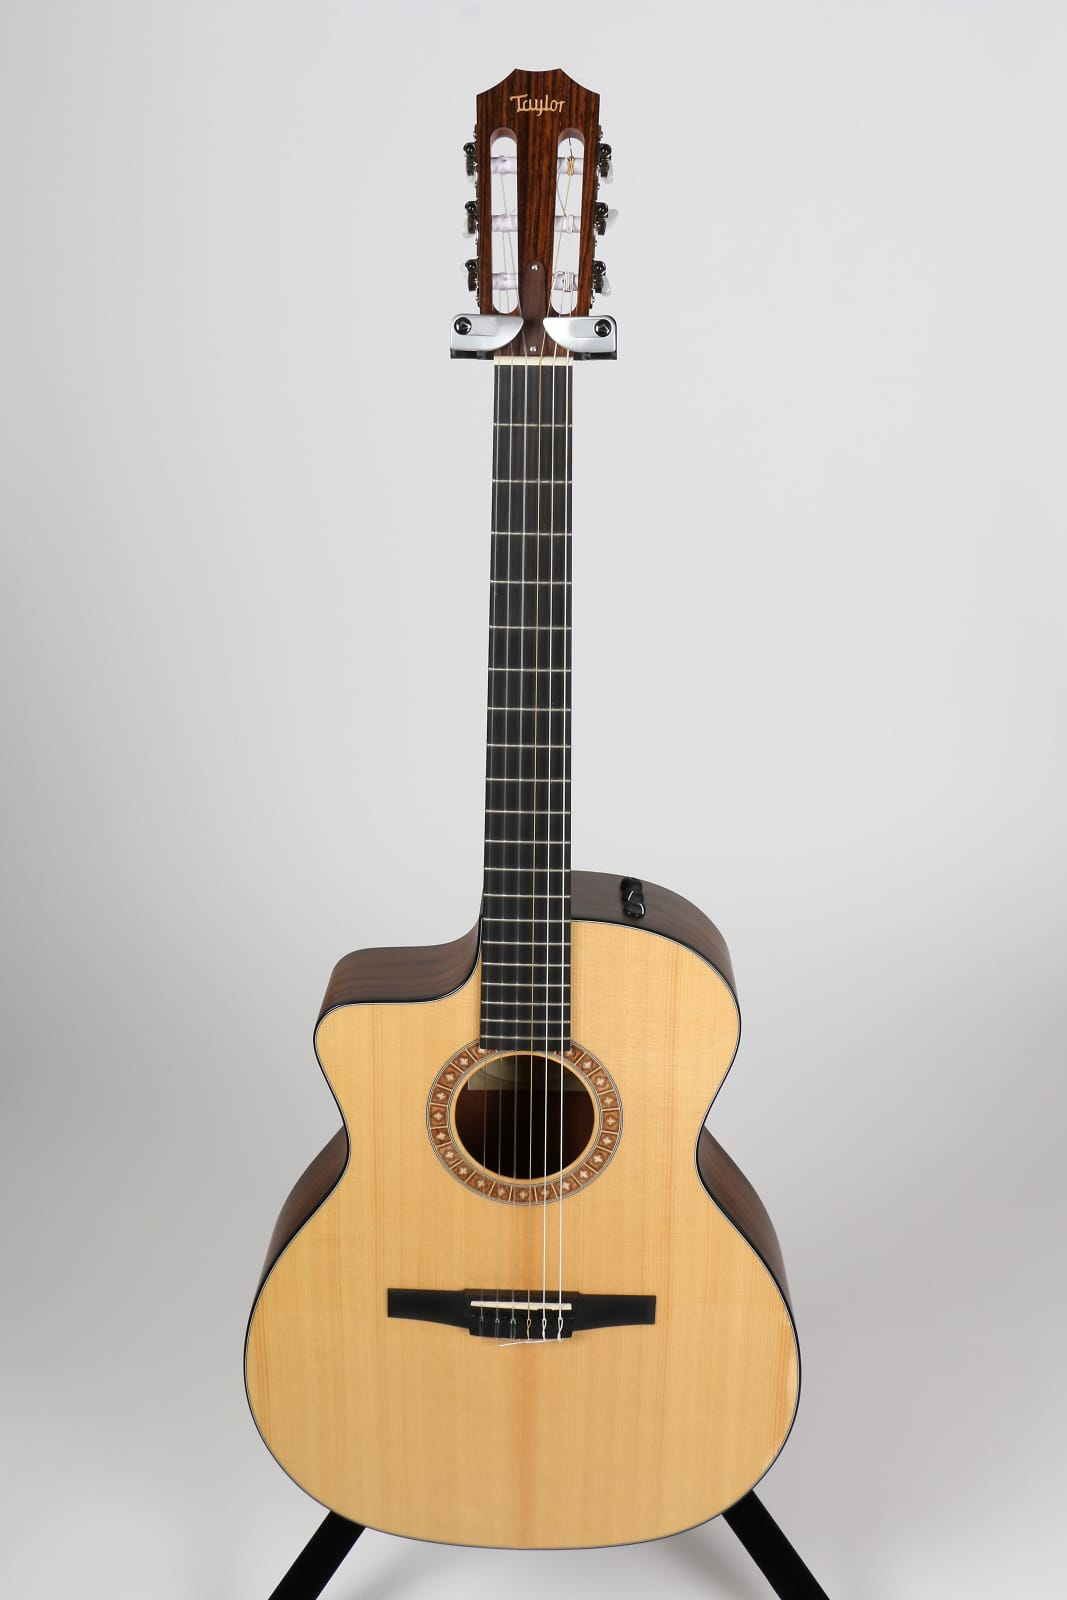 taylor ns24ce g nylon string classical guitar grand reverb. Black Bedroom Furniture Sets. Home Design Ideas